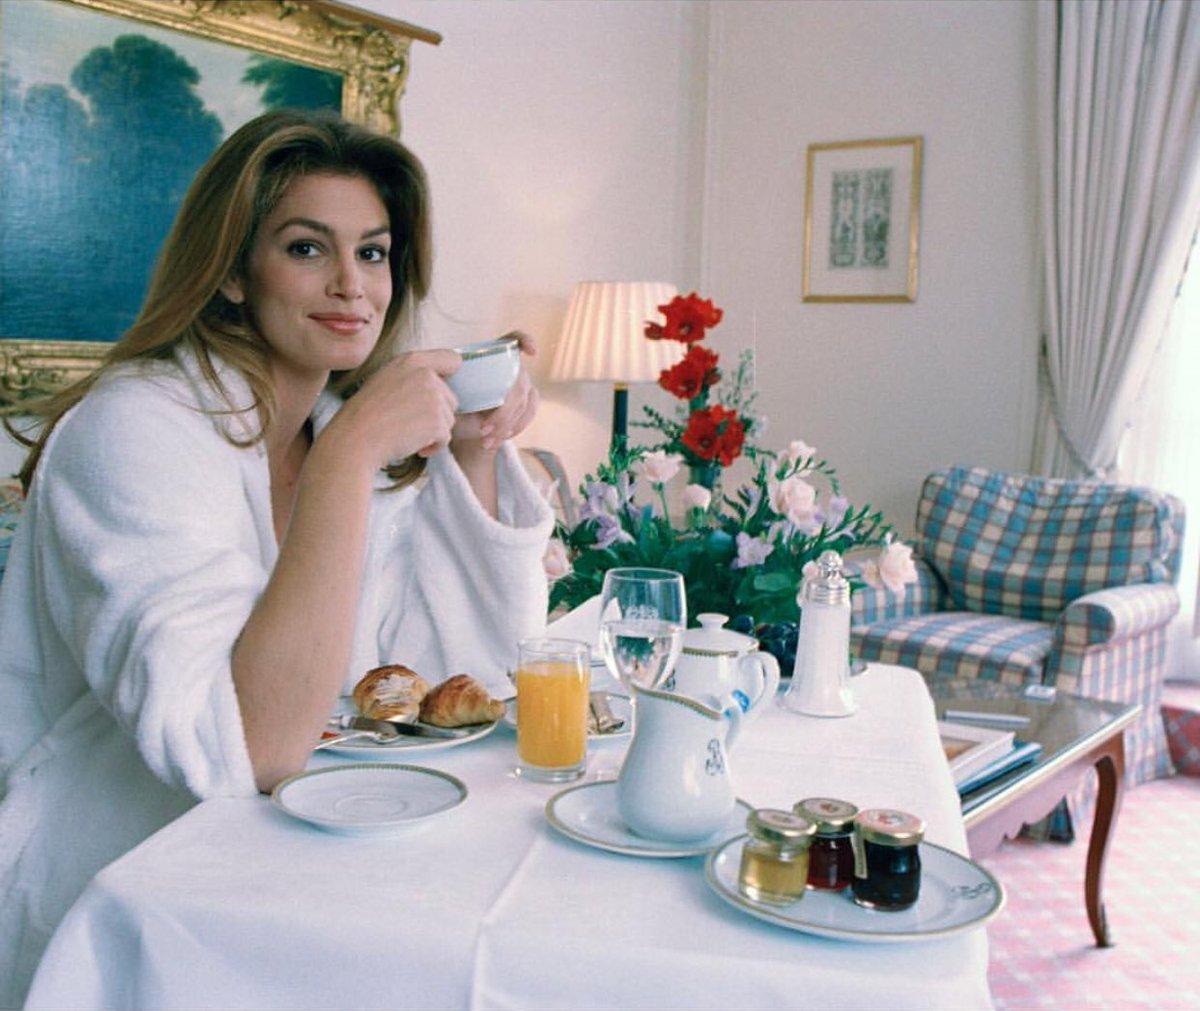 RT @MeaningfulBty: Breakfast in bed with @CindyCrawford ☕️ #FBF  https://t.co/Qq78dYxDkO https://t.co/h8VBwm3ua6